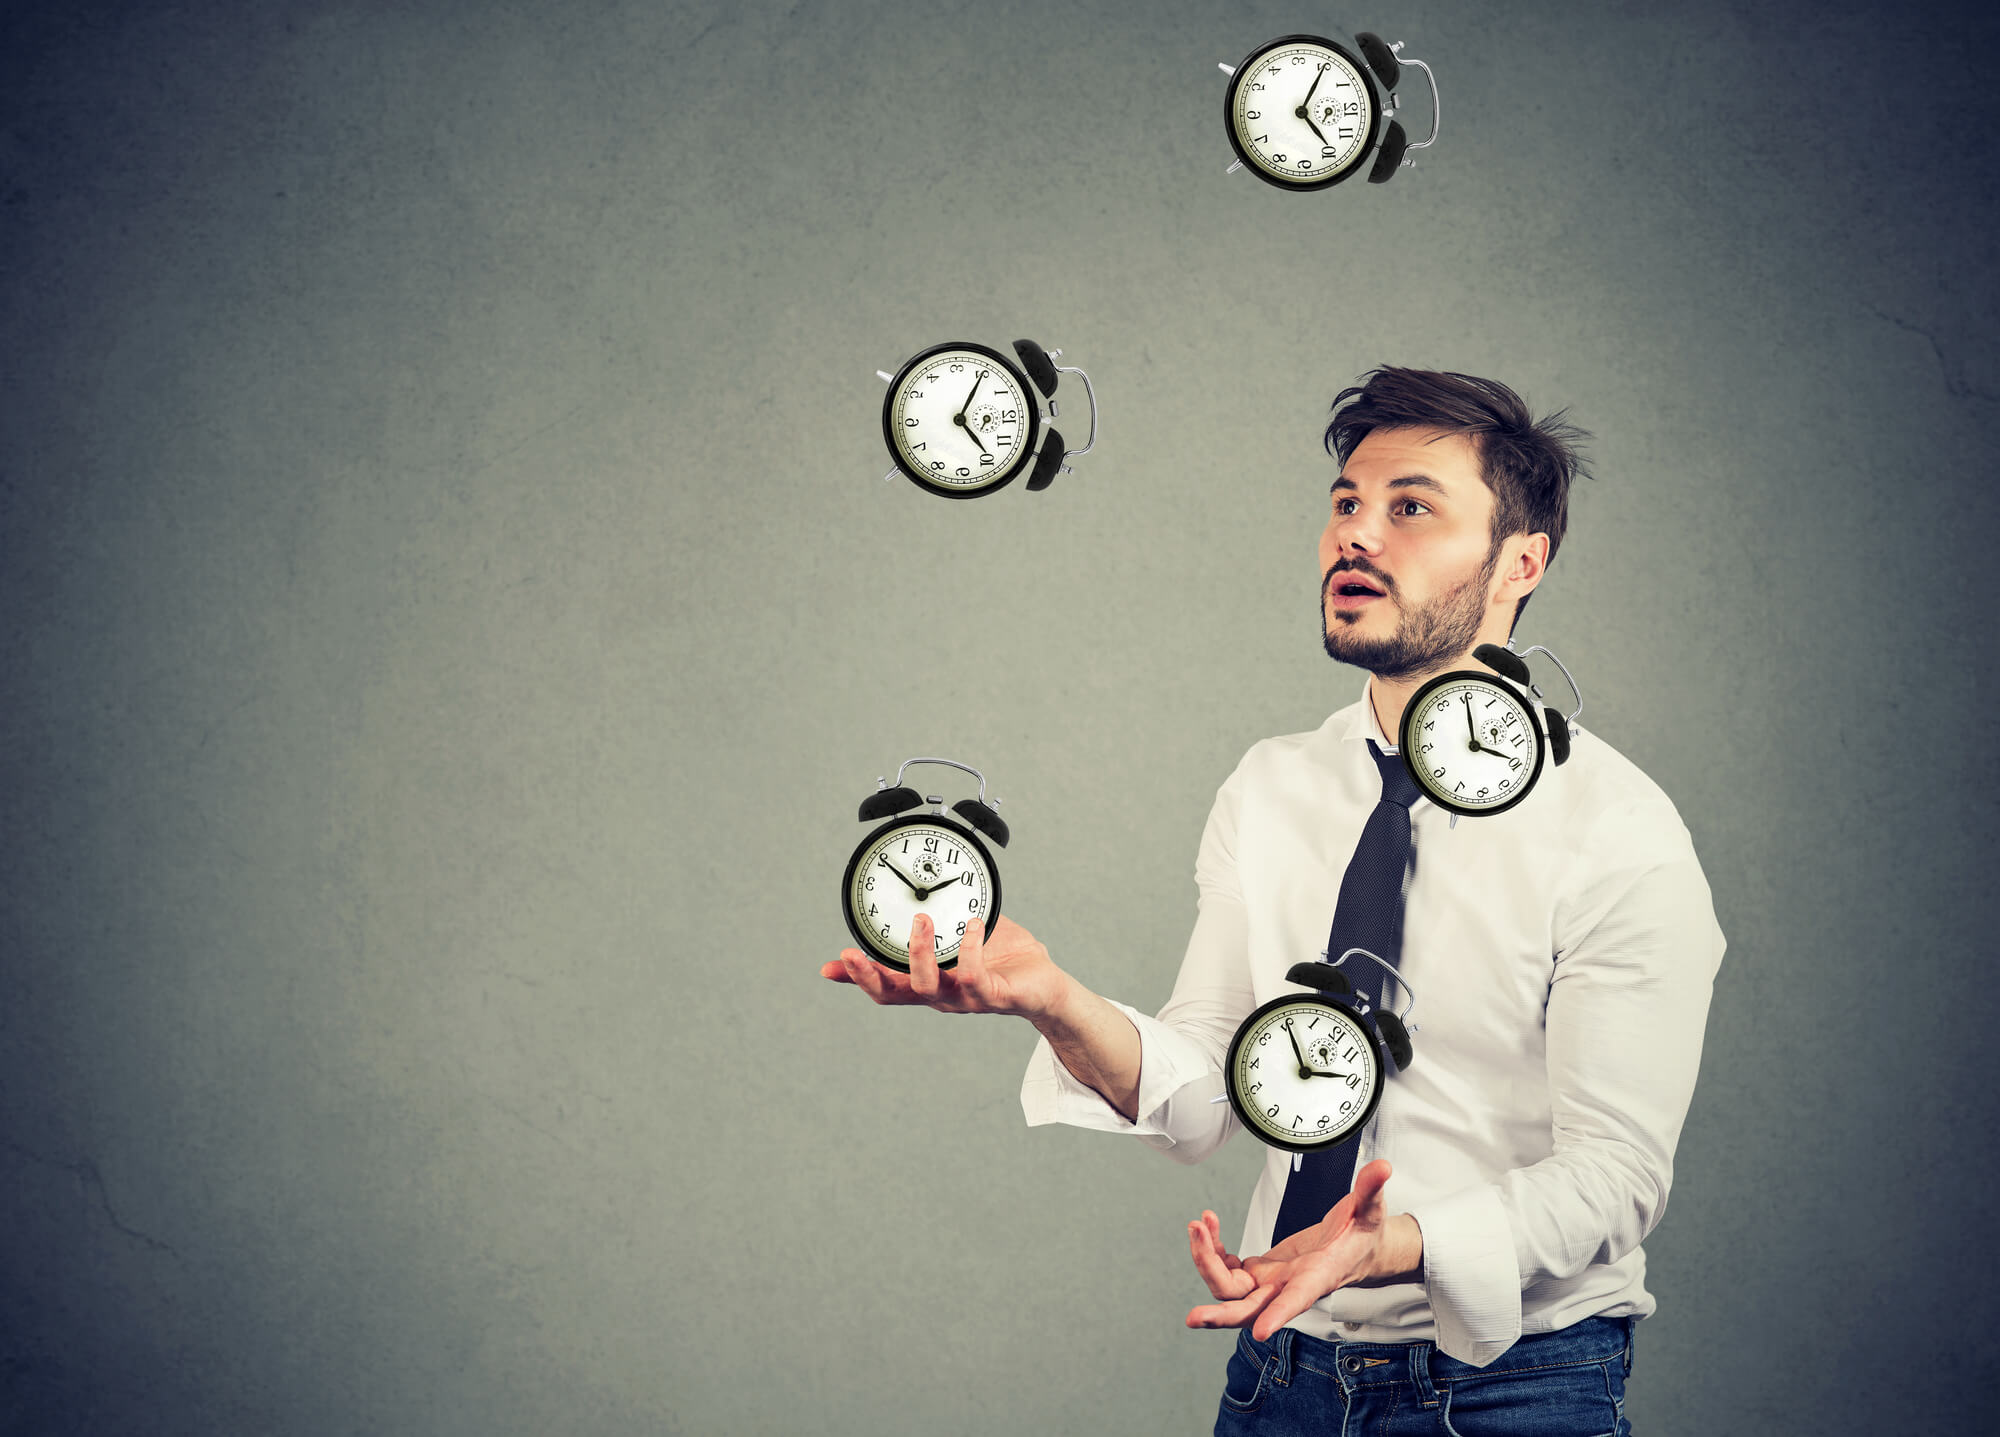 jornada informativa registro jornada laboral